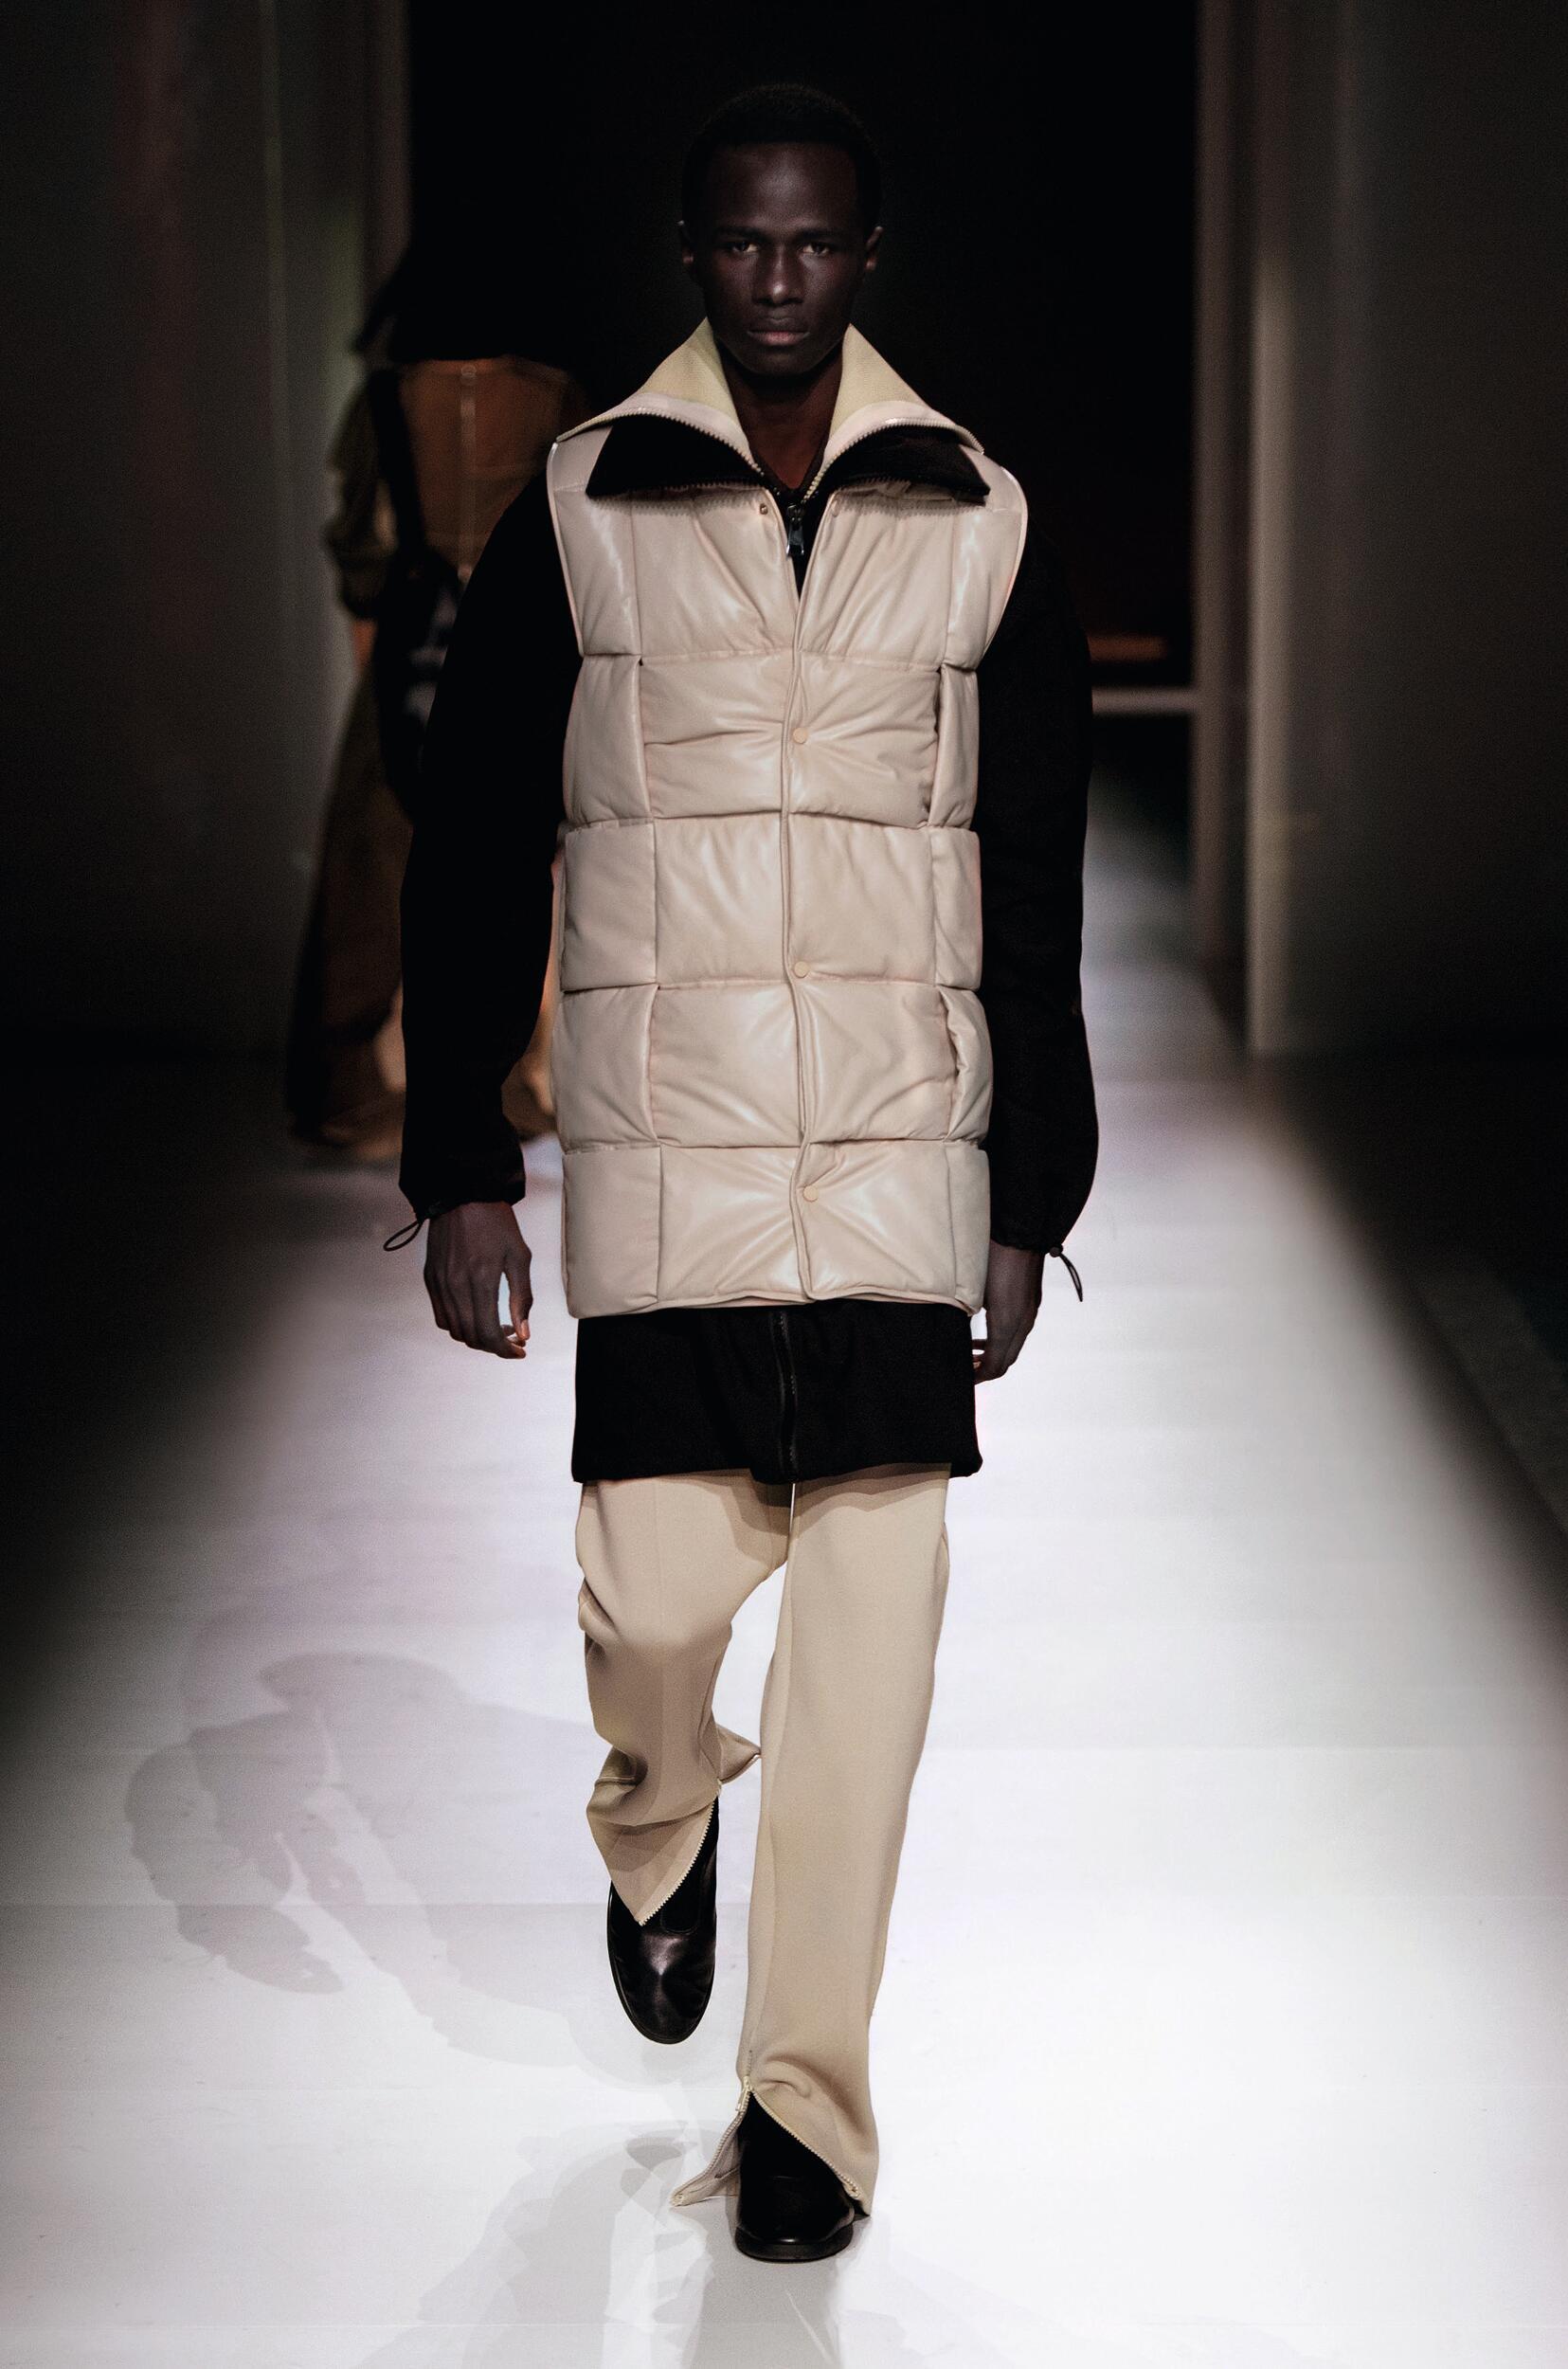 2020 Catwalk Bottega Veneta Man Fashion Show Winter